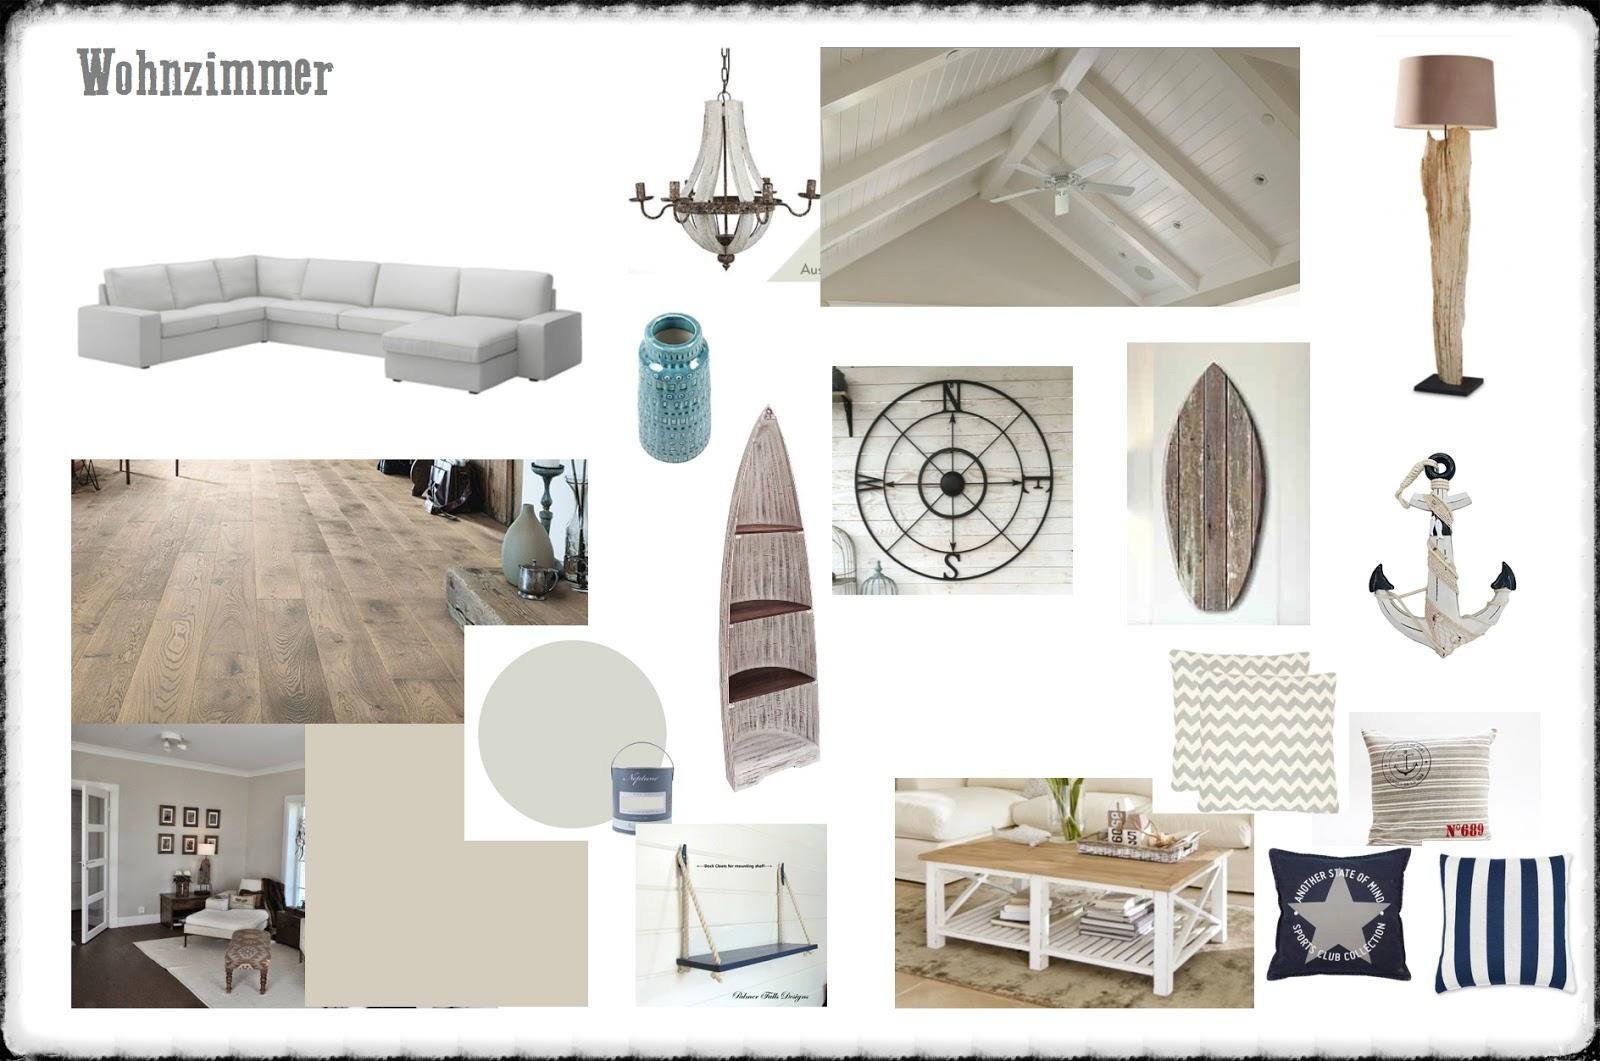 Einrichtungsideen Raum für Raum - Beachhouse Living